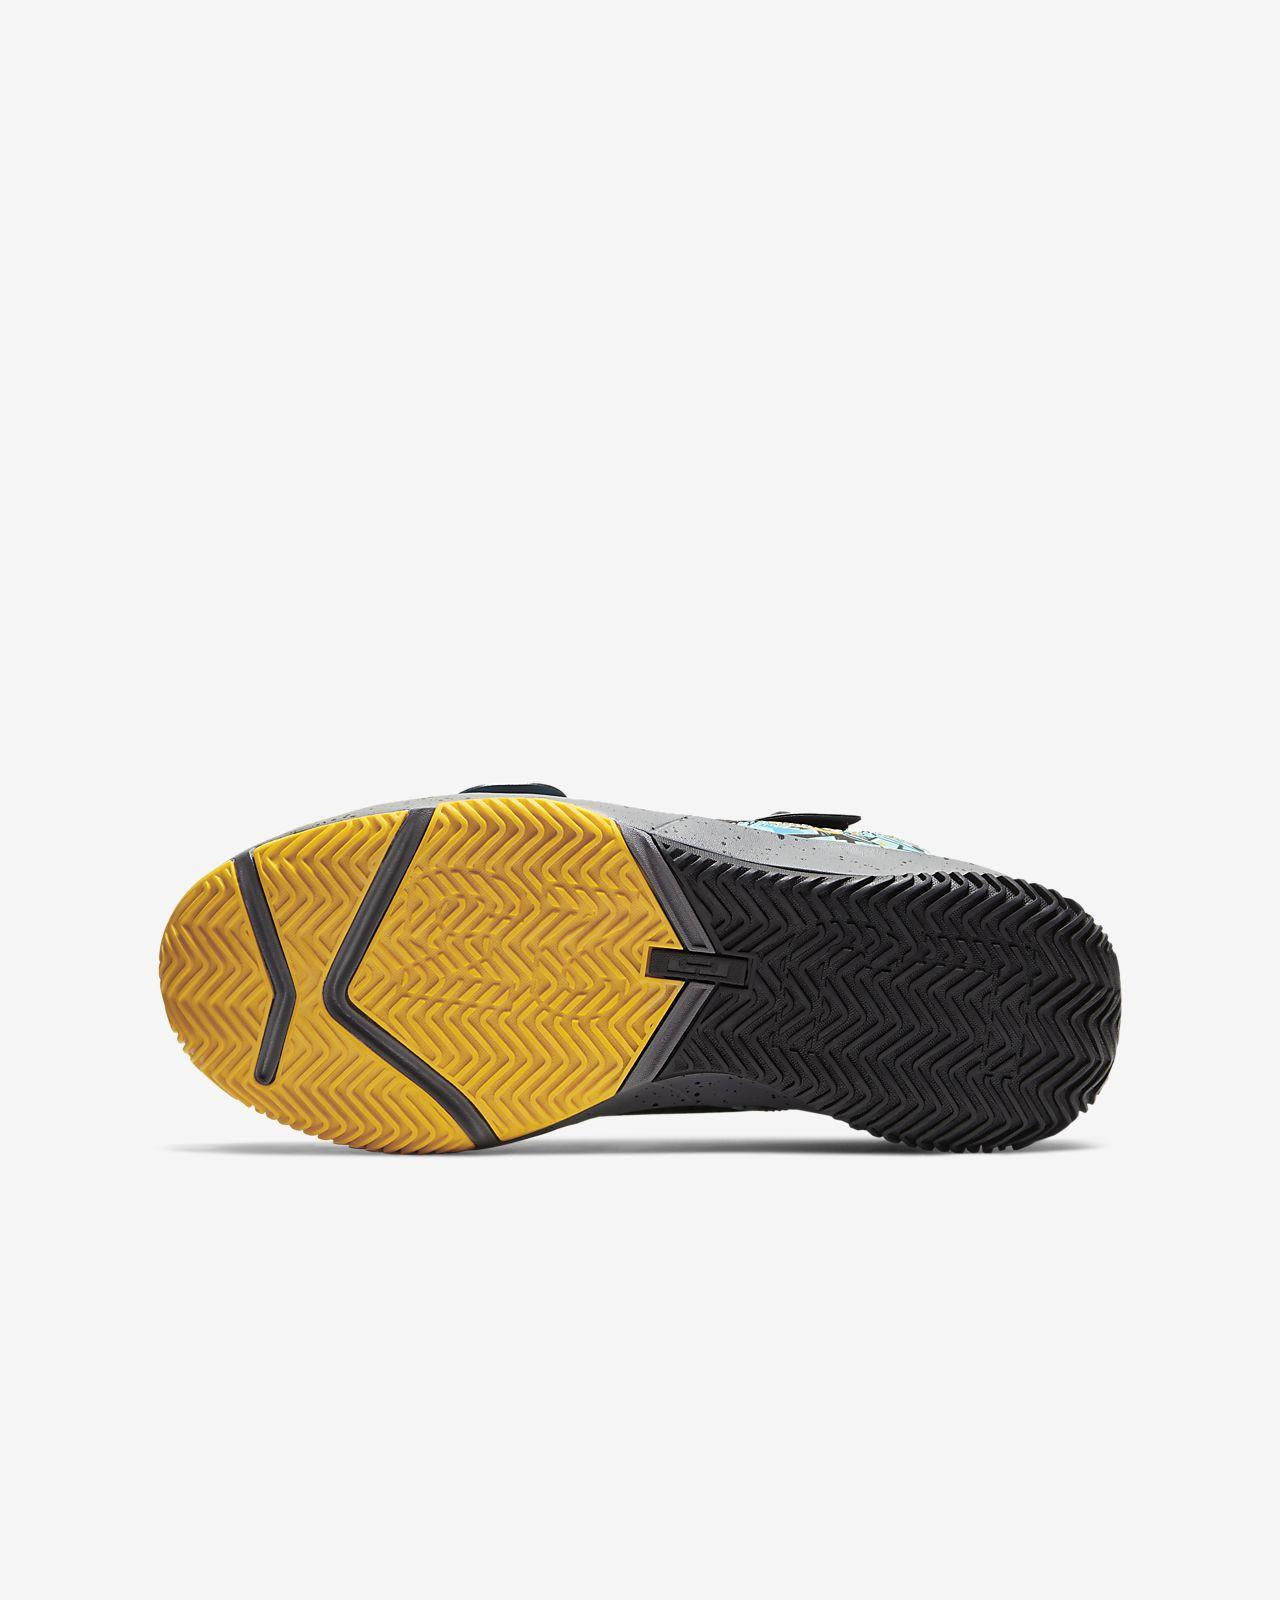 NIKE ZOOM LEBRON SOLDIER 9 FLYEASE. Nike Store, zipper wrap